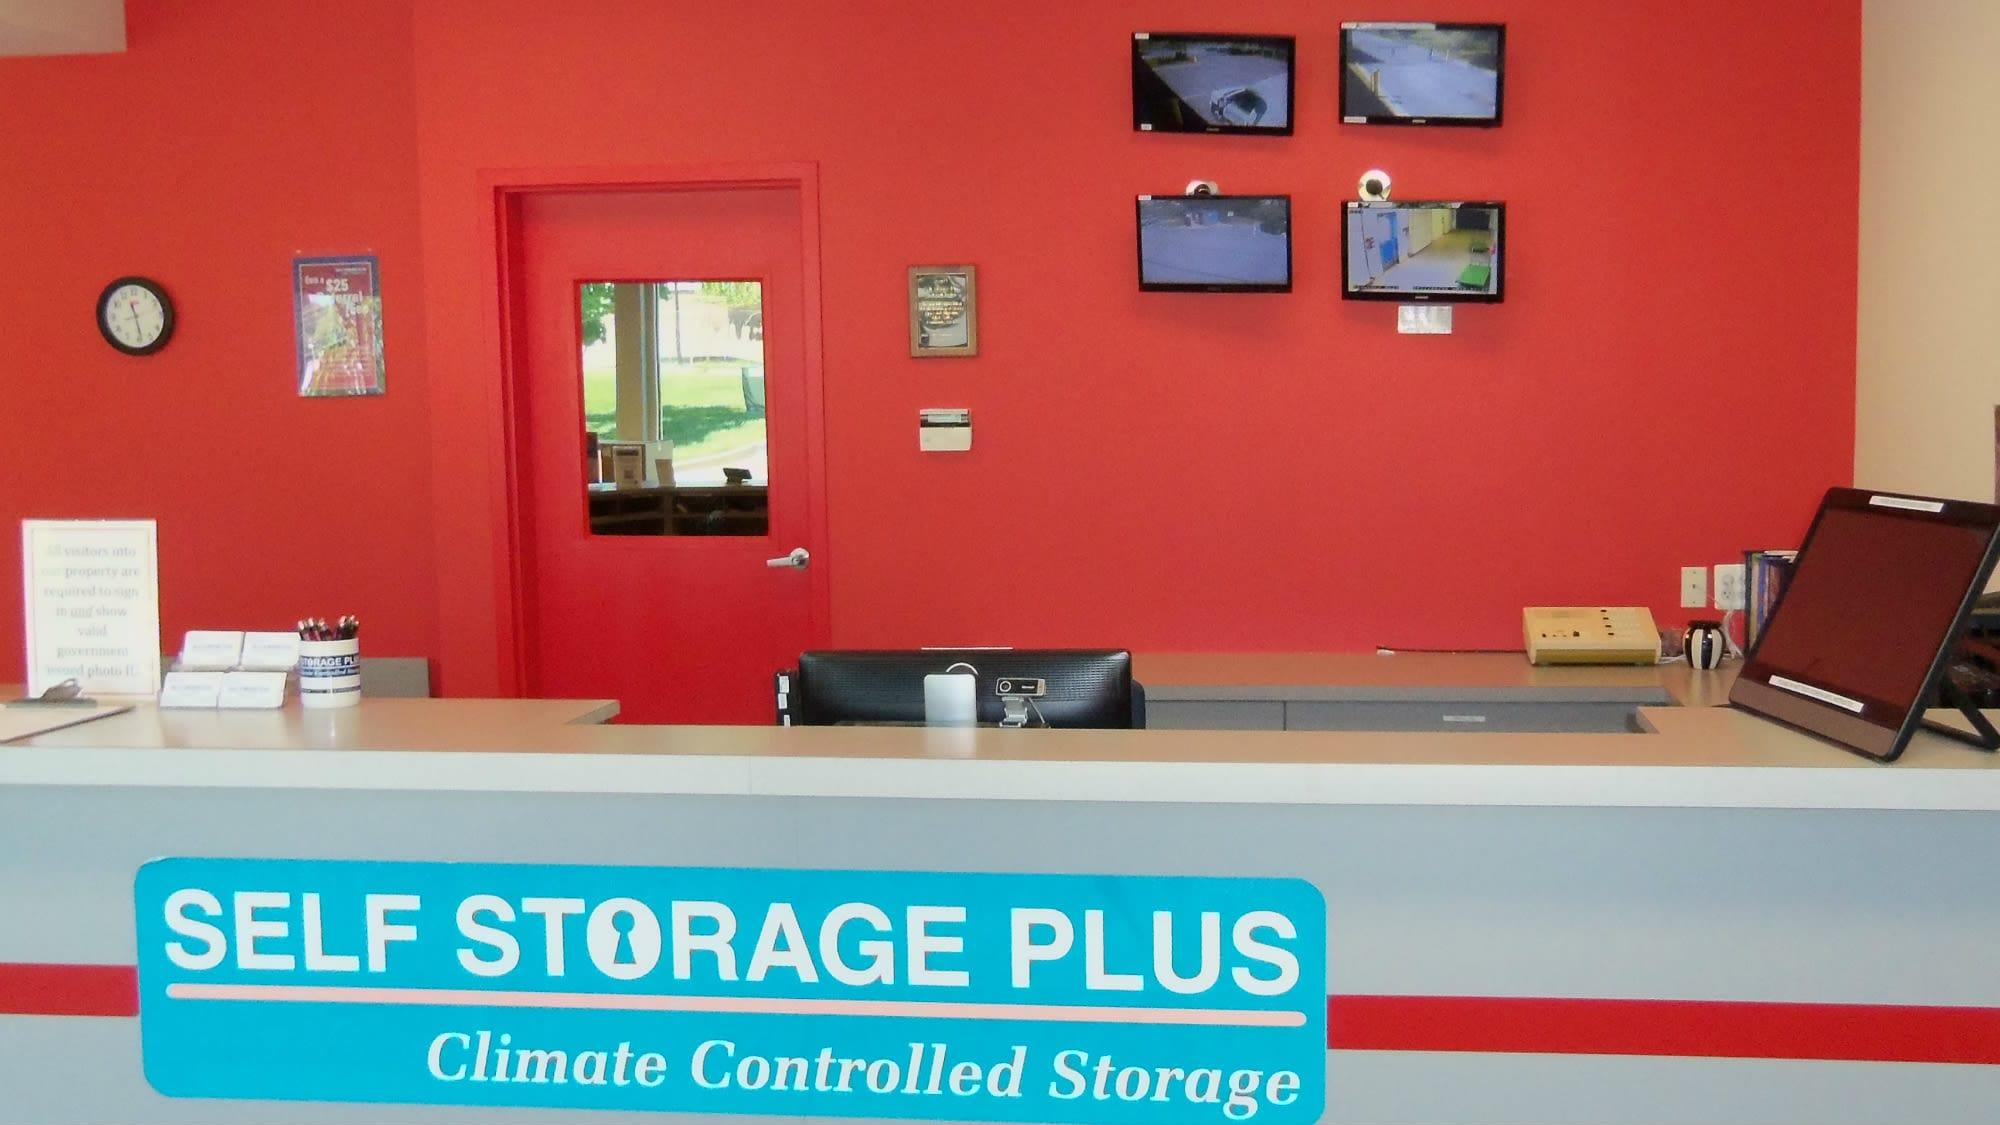 Leasing desk at Self Storage Plus in Walkersville, MD